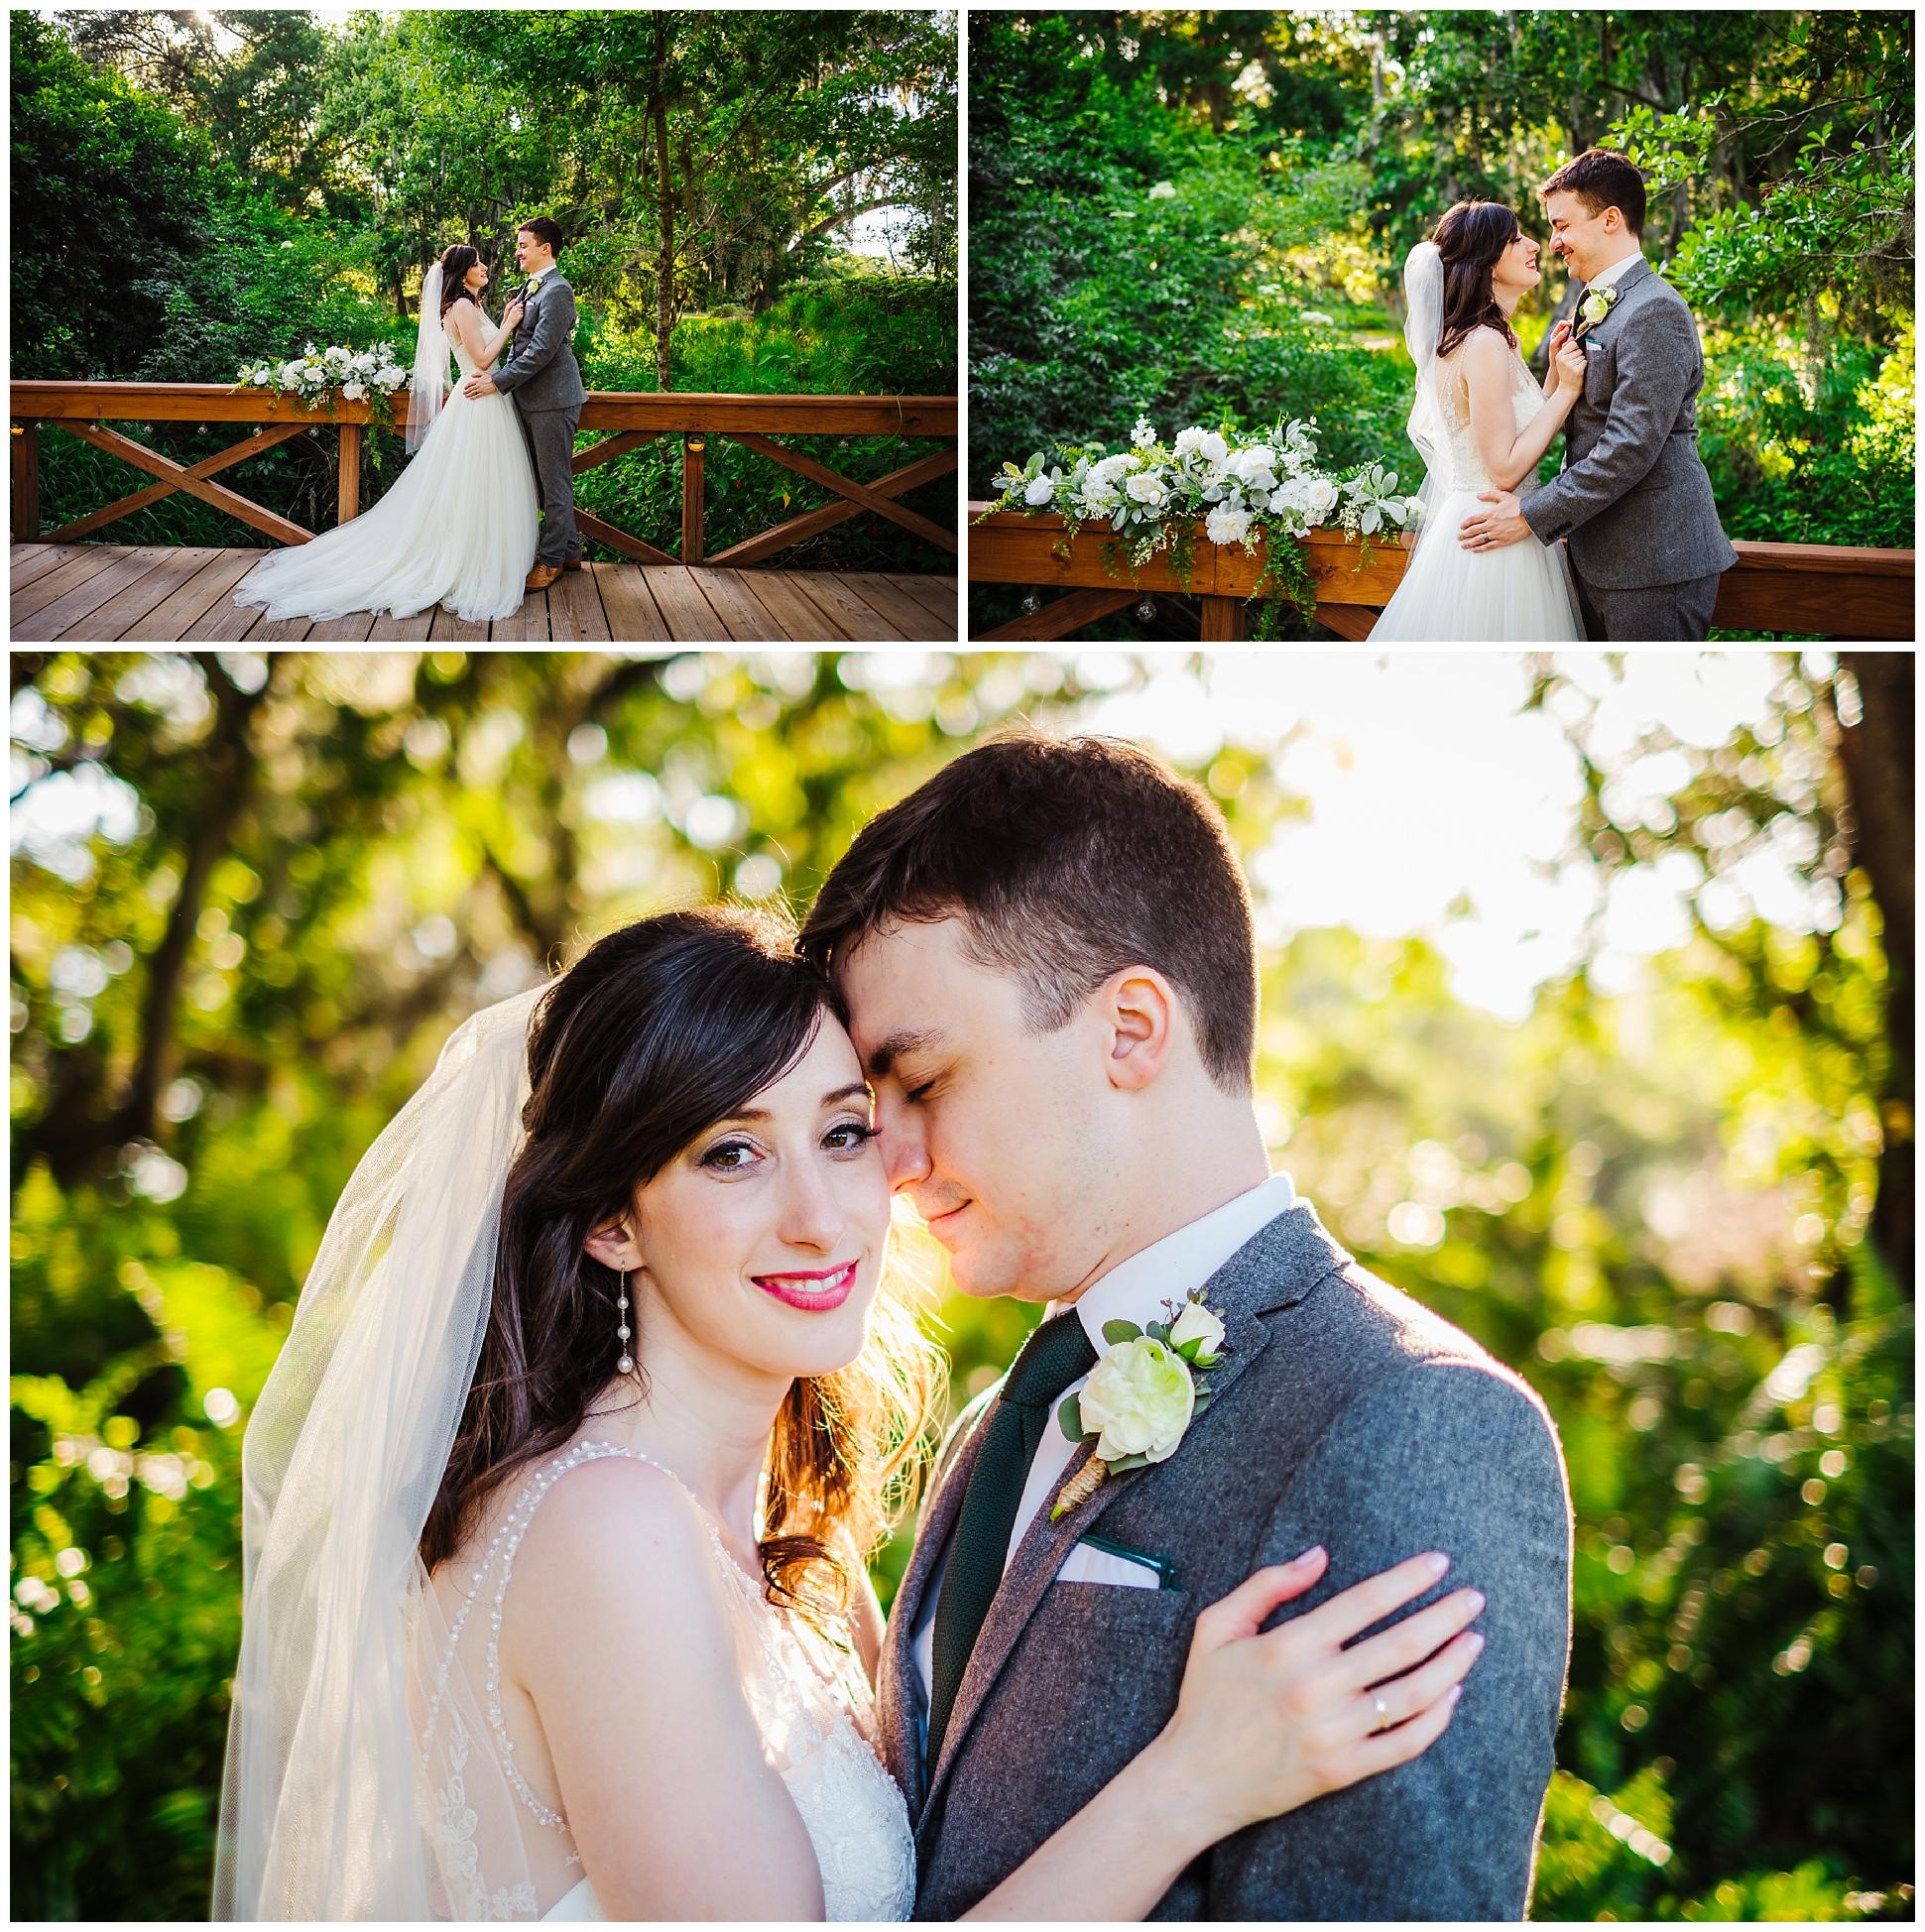 cross-creek-ranch-tampa-wedding-photographer-lush-green-white-florals_0044.jpg